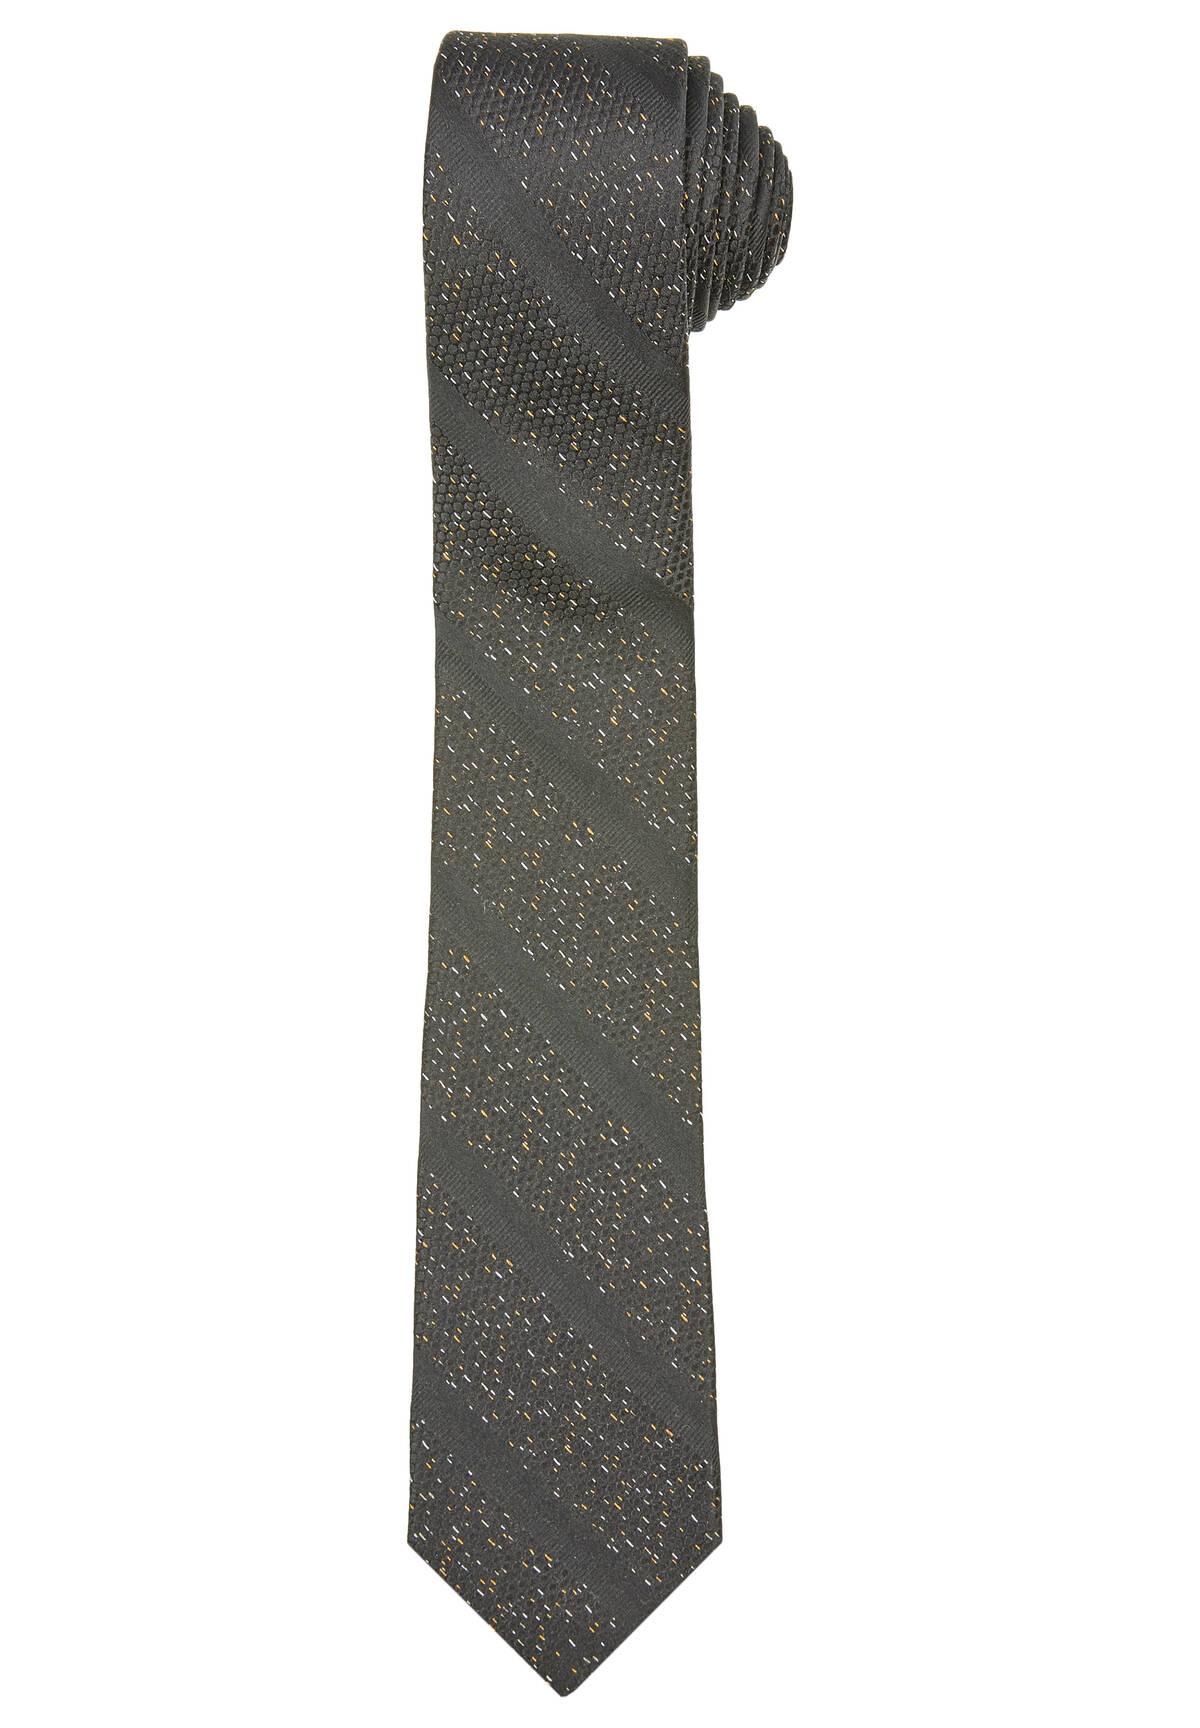 Krawatte 7cm / TIE 7CM